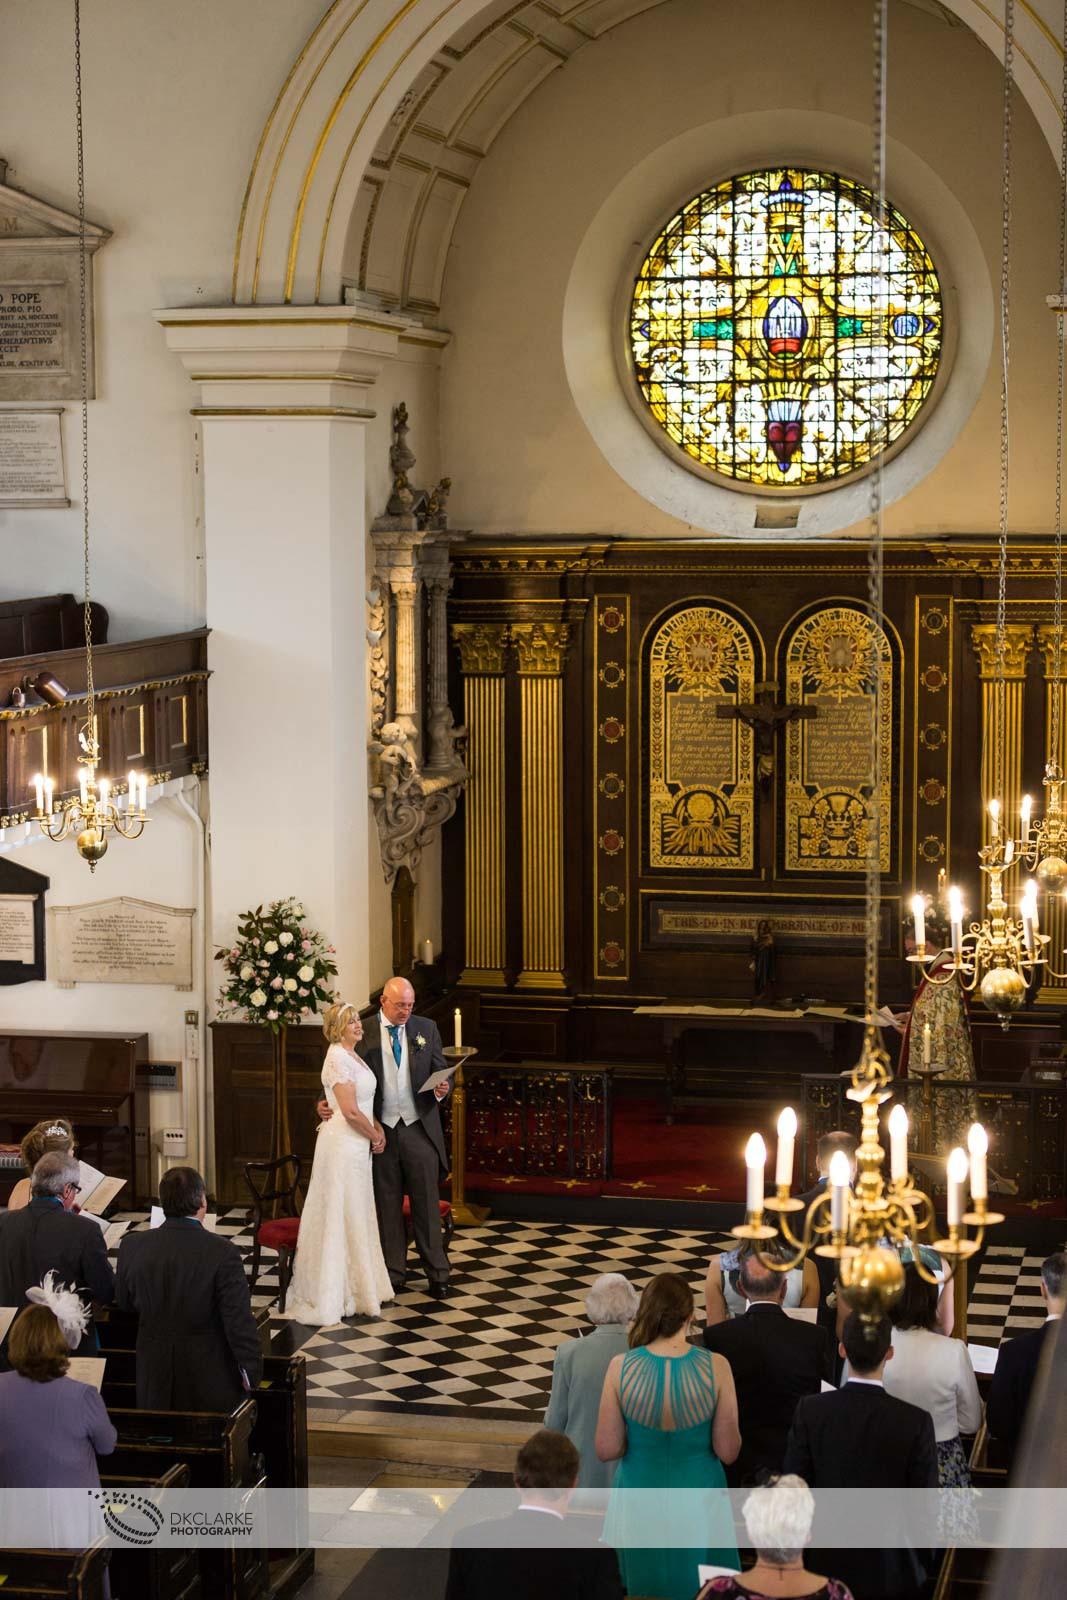 Wedding at St Mary's church, Twickenham